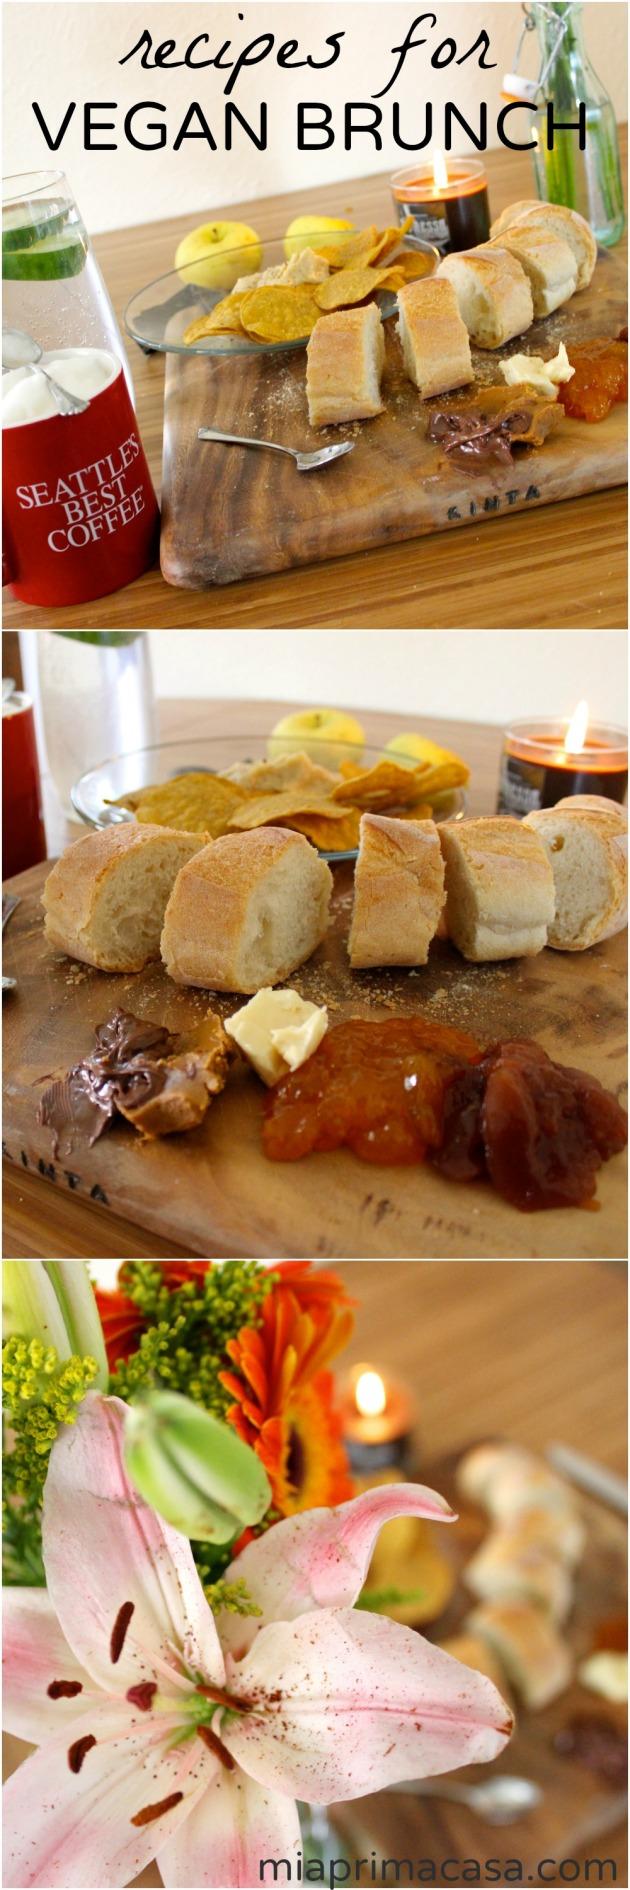 Recipes for Vegan Brunch on miaprimacasa.com